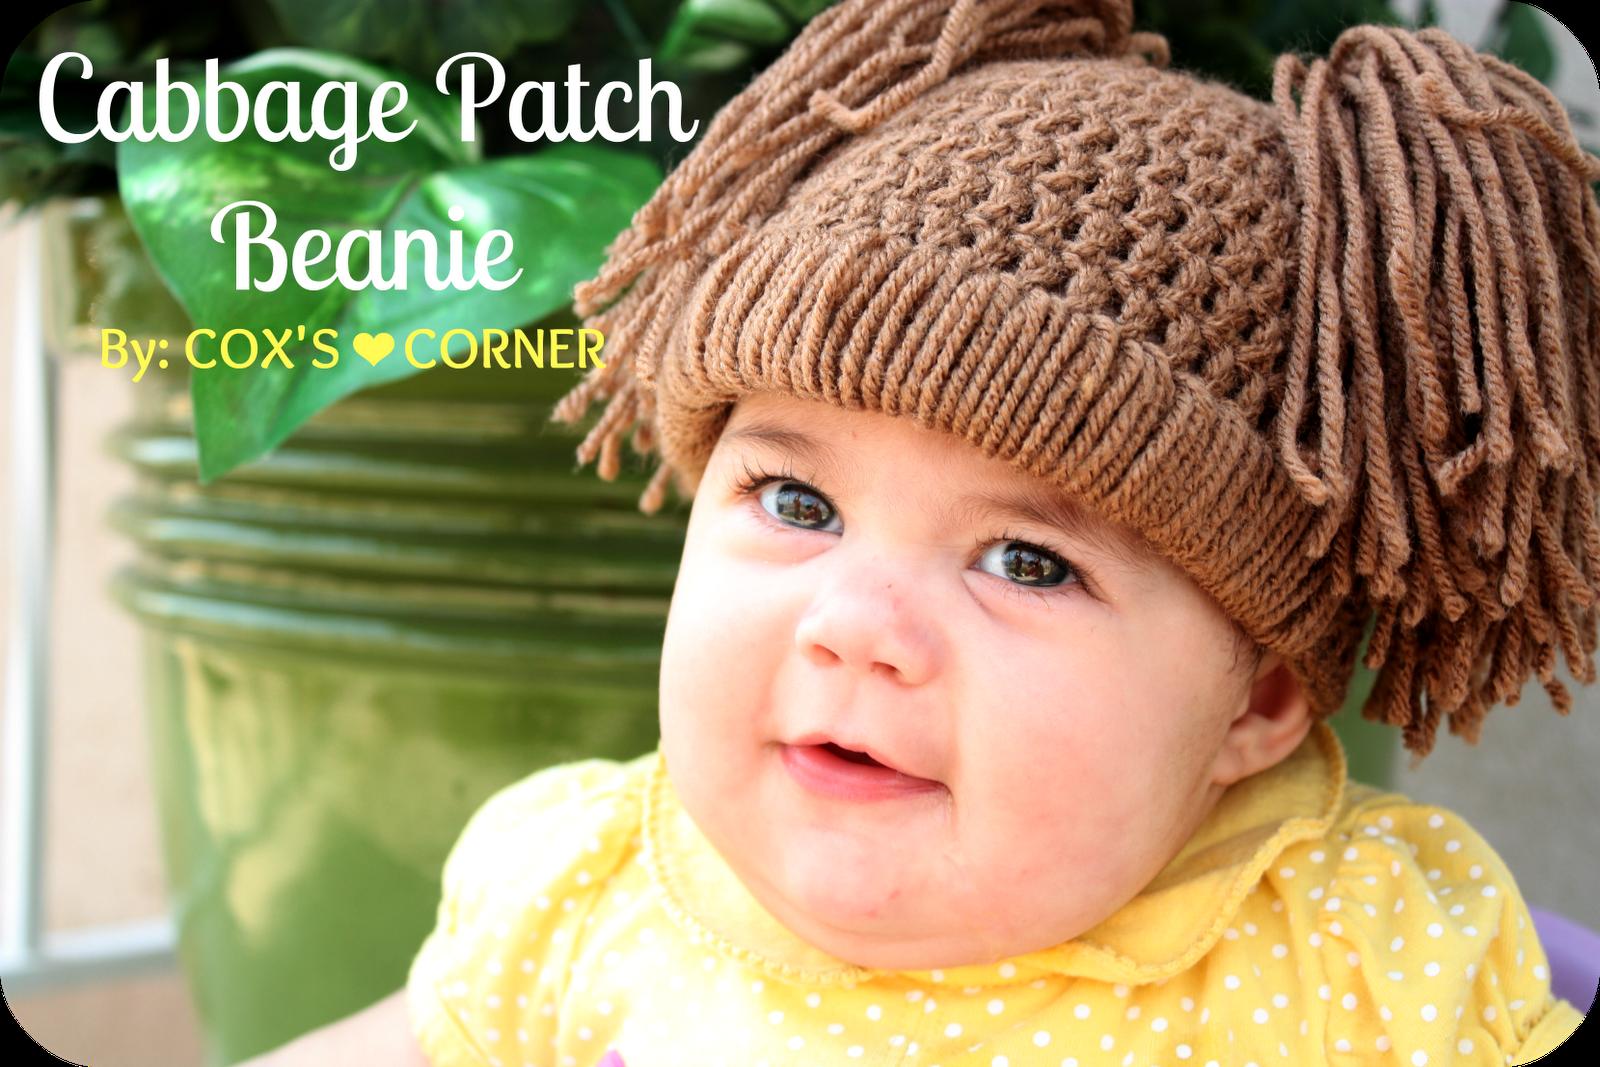 Coxs Corner Cabbage Patch Doll Hat Tutorial Crochet Knitting